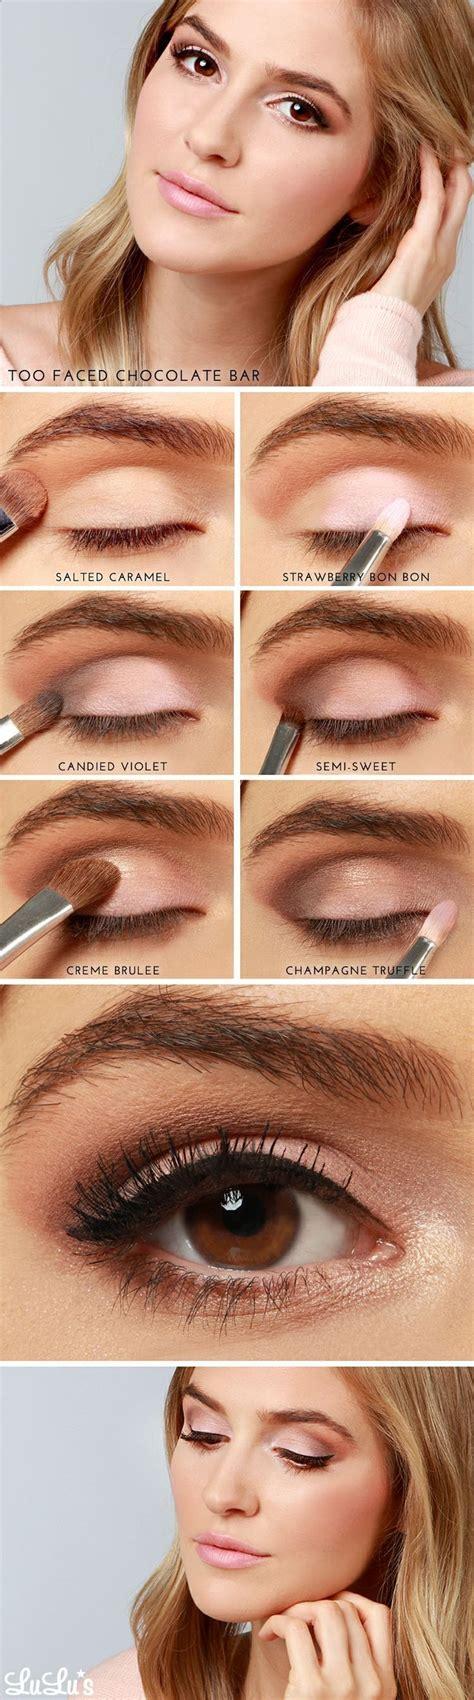 natural makeup tutorial over 40 7363 best images about face makeup on pinterest natural